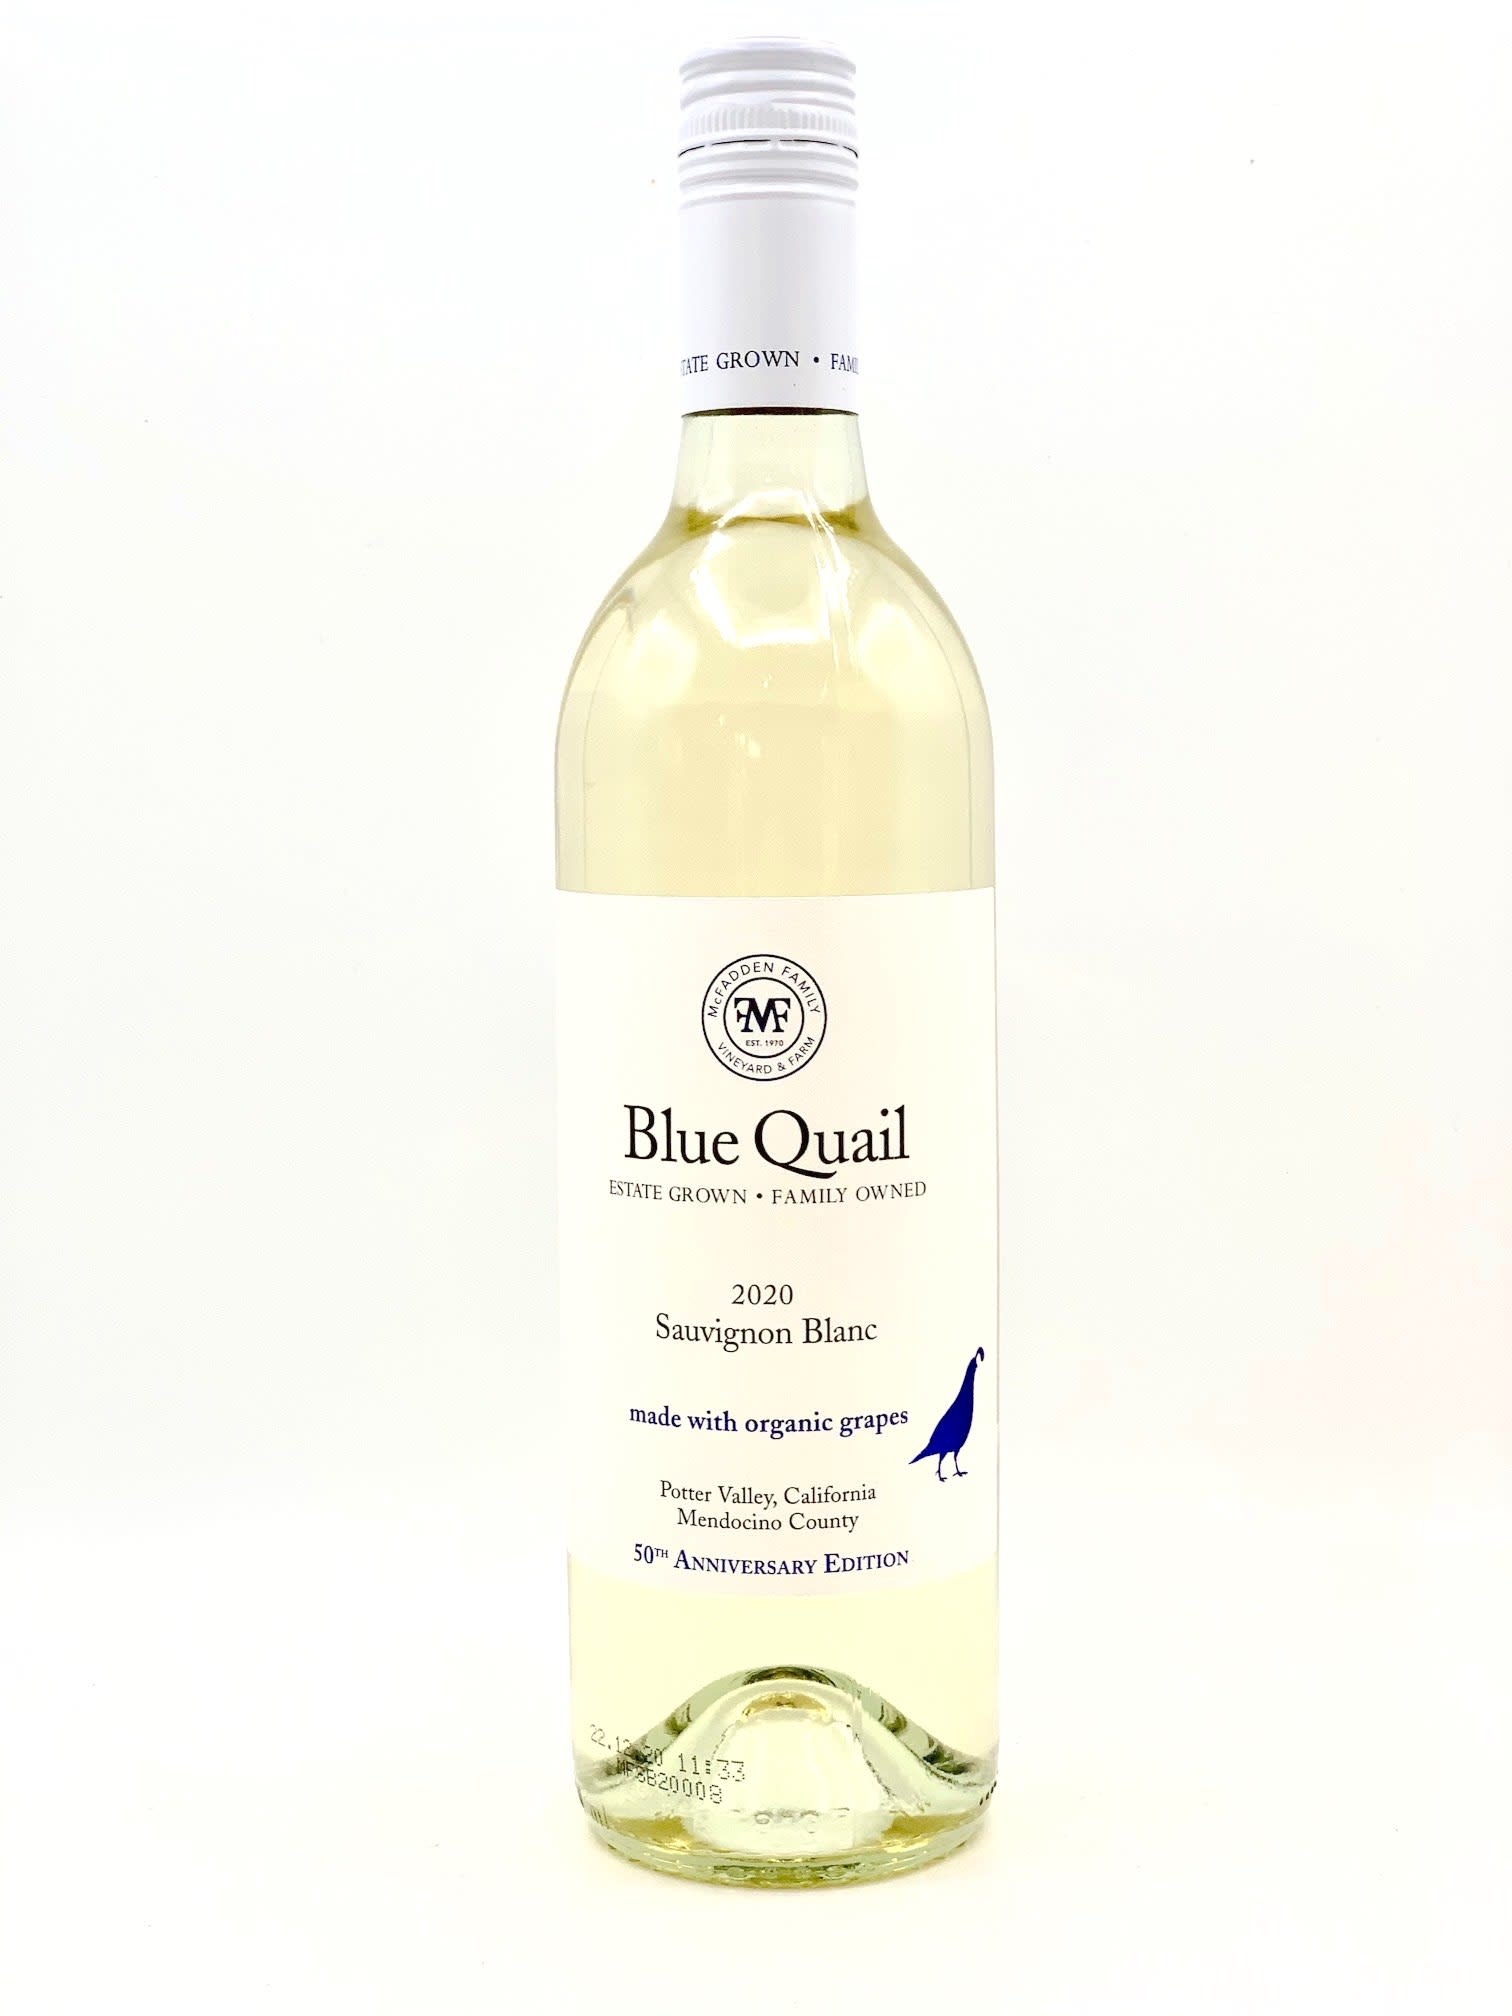 Potter Valley Sauvignon Blanc 2020 Blue Quail 750ml